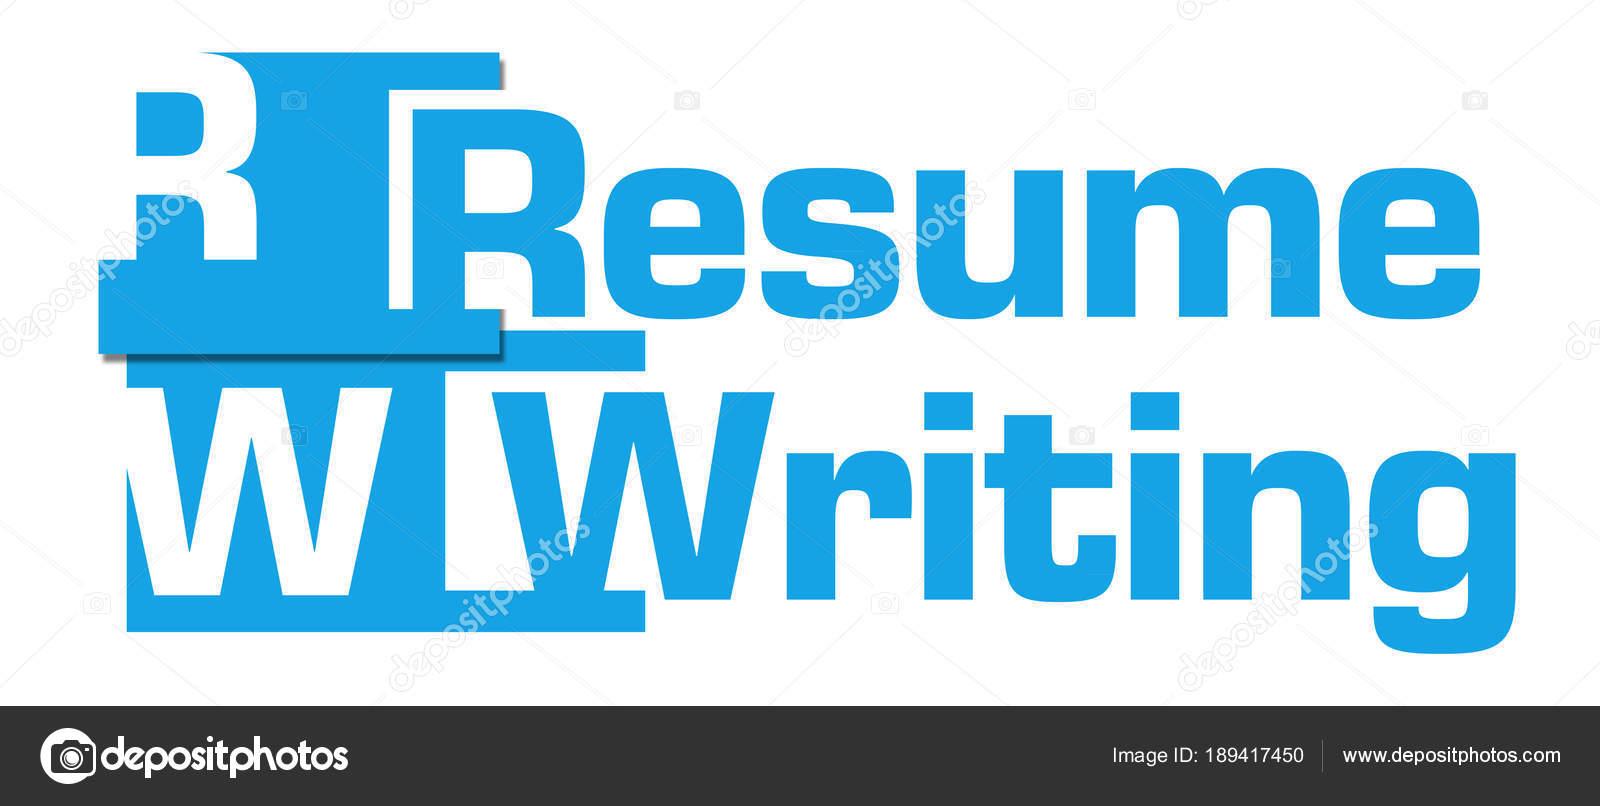 Resume Writing Text Written Blue Background Stock Photo